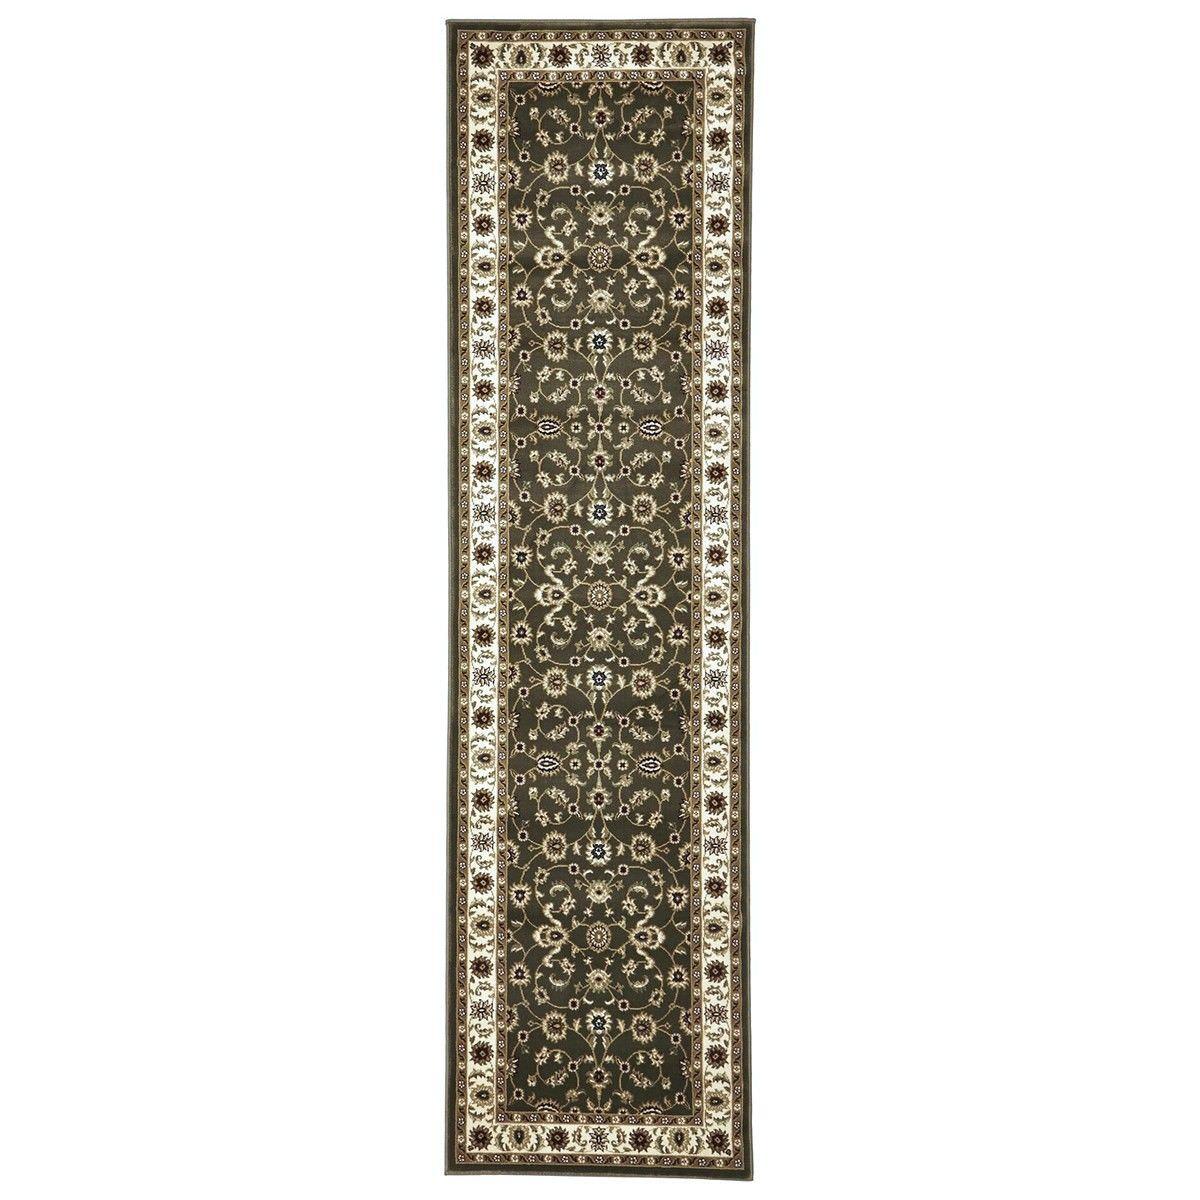 Sydney Classic Turkish Made Oriental Runner Rug, 400x80cm, Green / Ivory